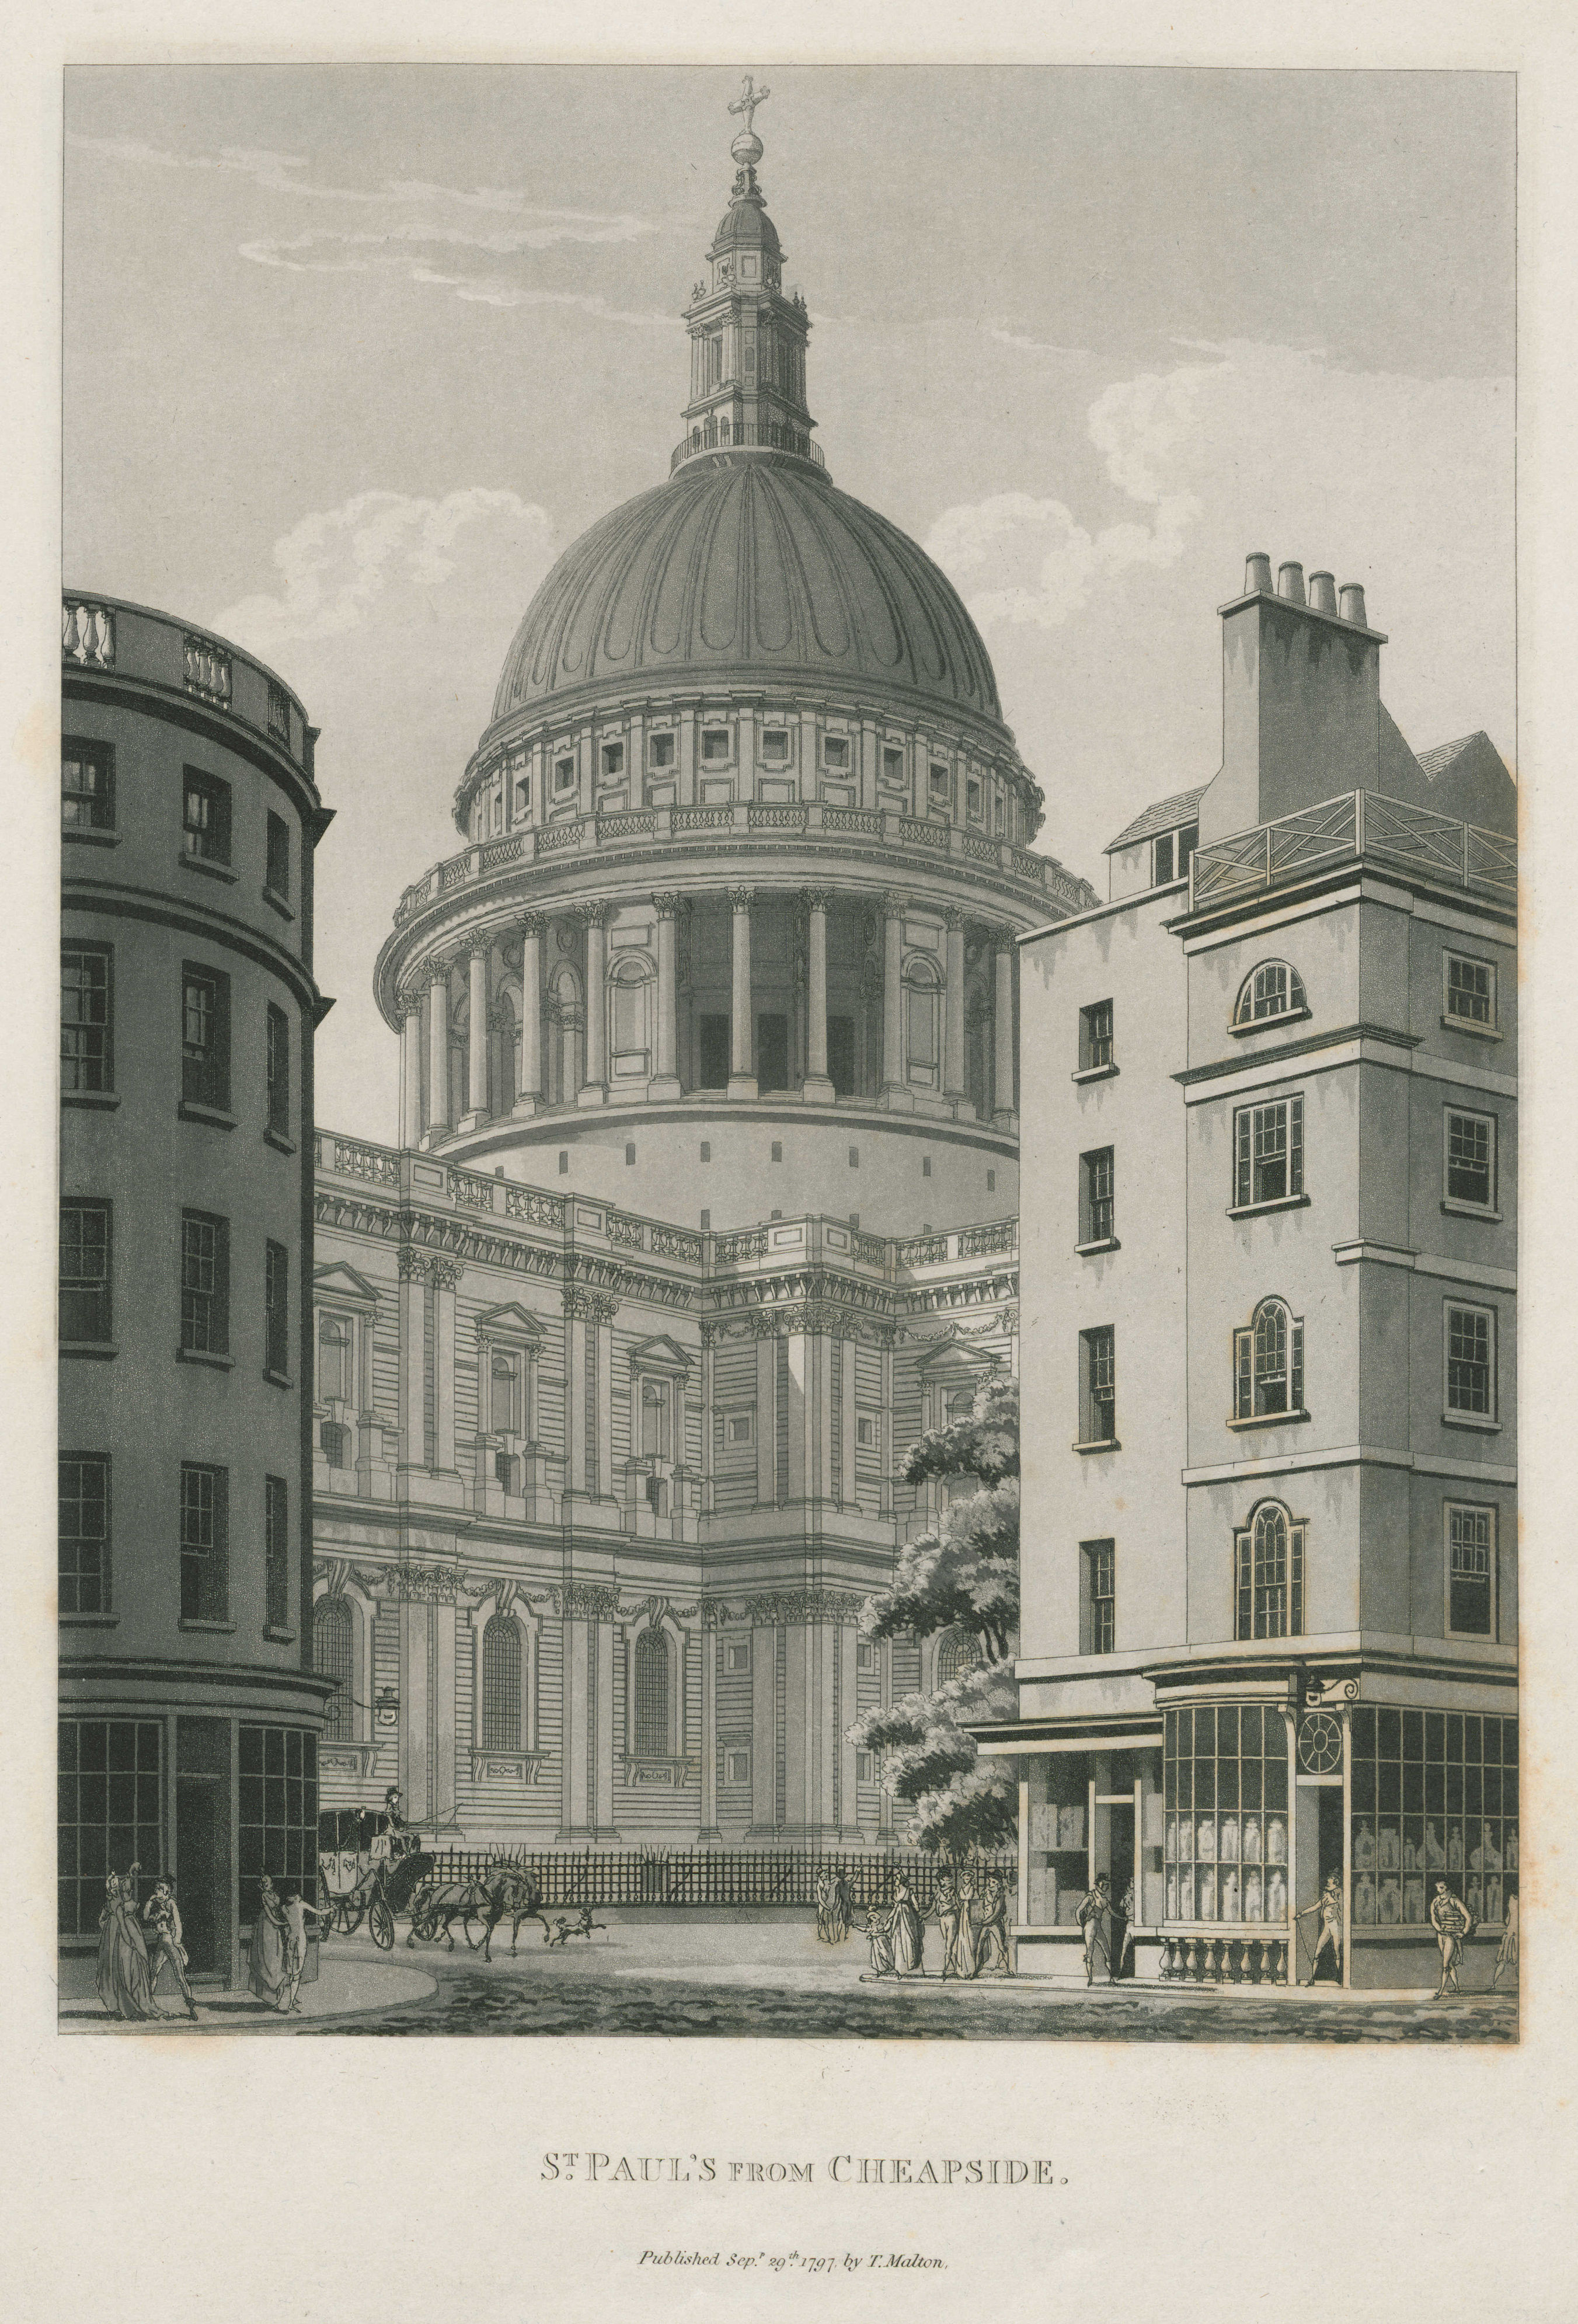 056 - Malton - St Paul's from Cheapside